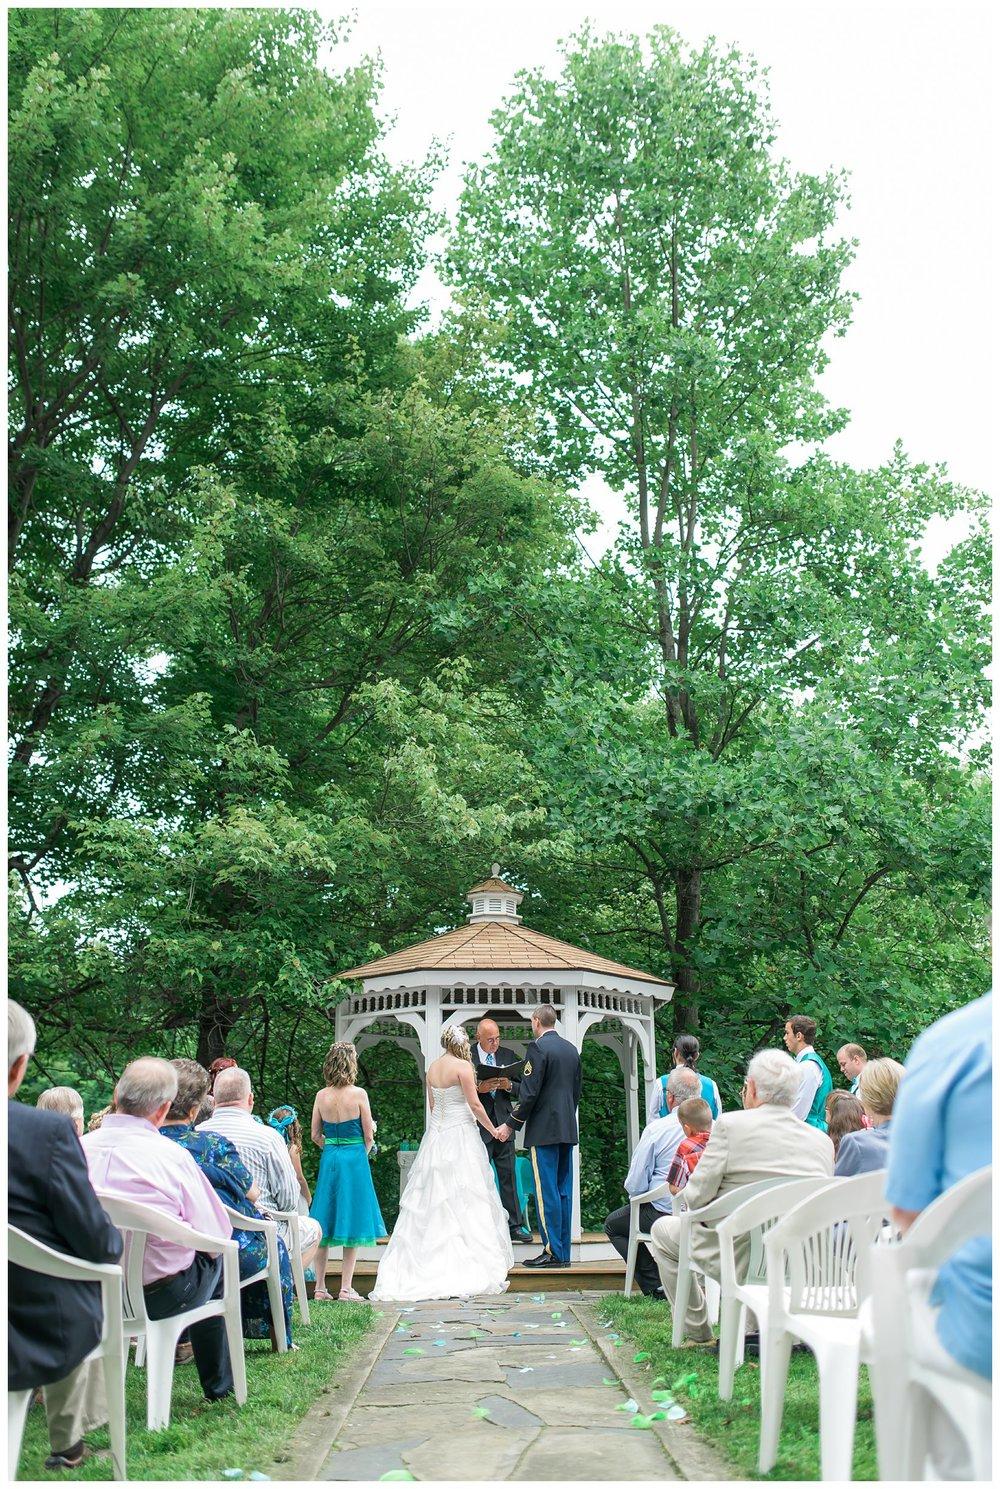 Stephanie Kopf photography Virginia Wedding Photographer | Nature | Love bird Theme | Mountain Top | Outdoor |